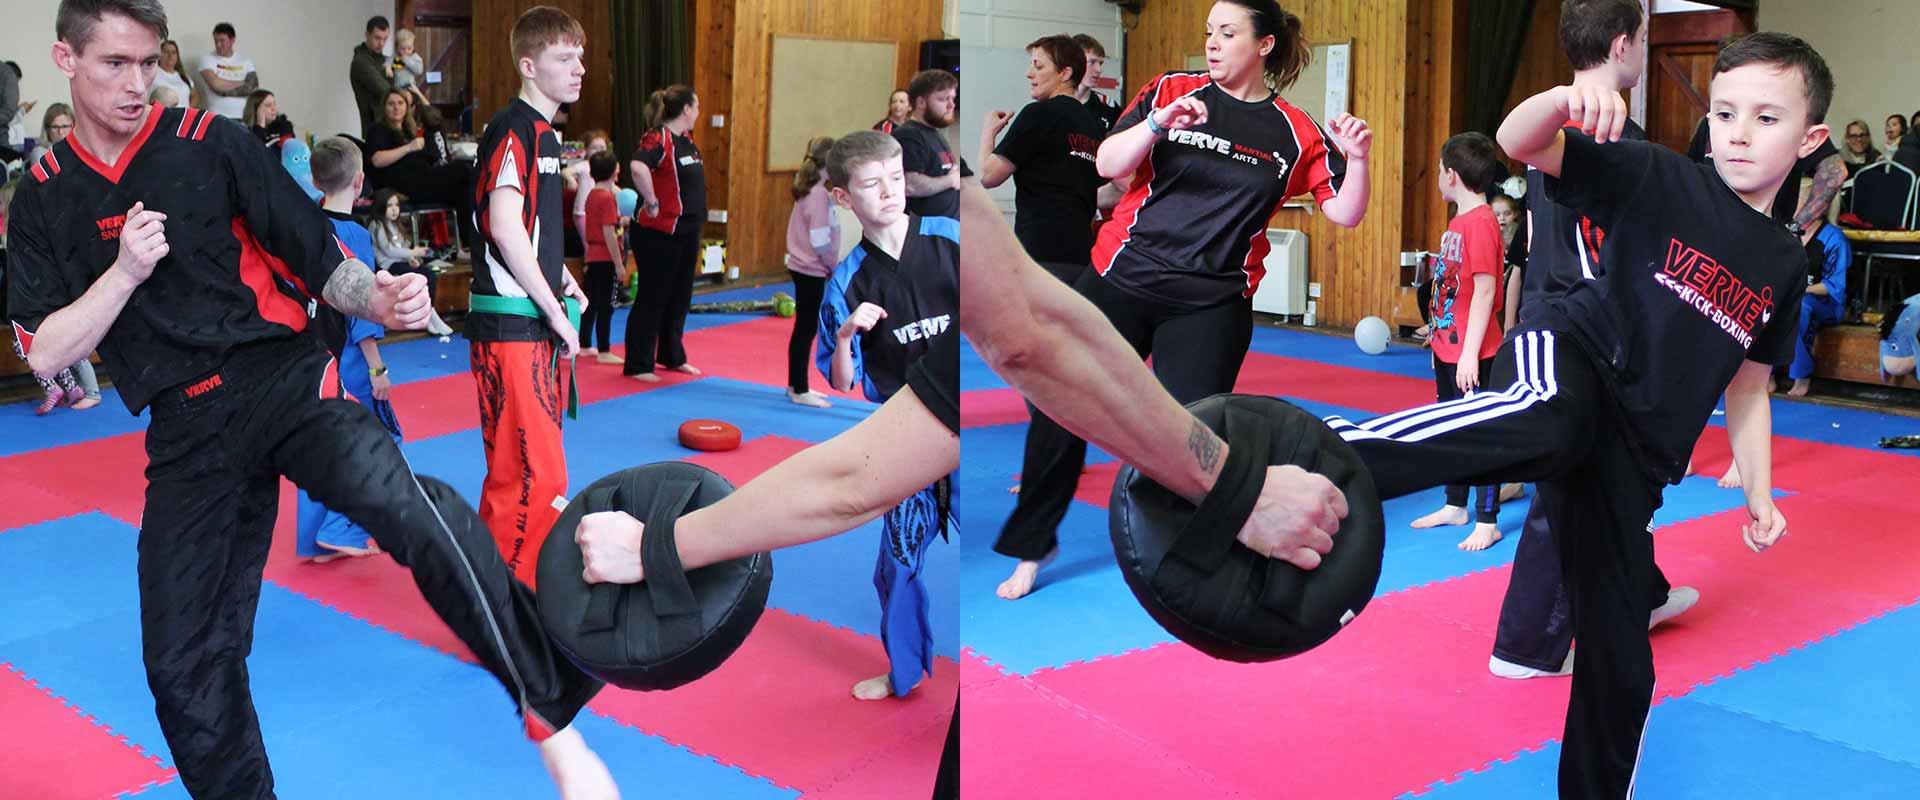 Verve Kick Boxing Bromsgrove